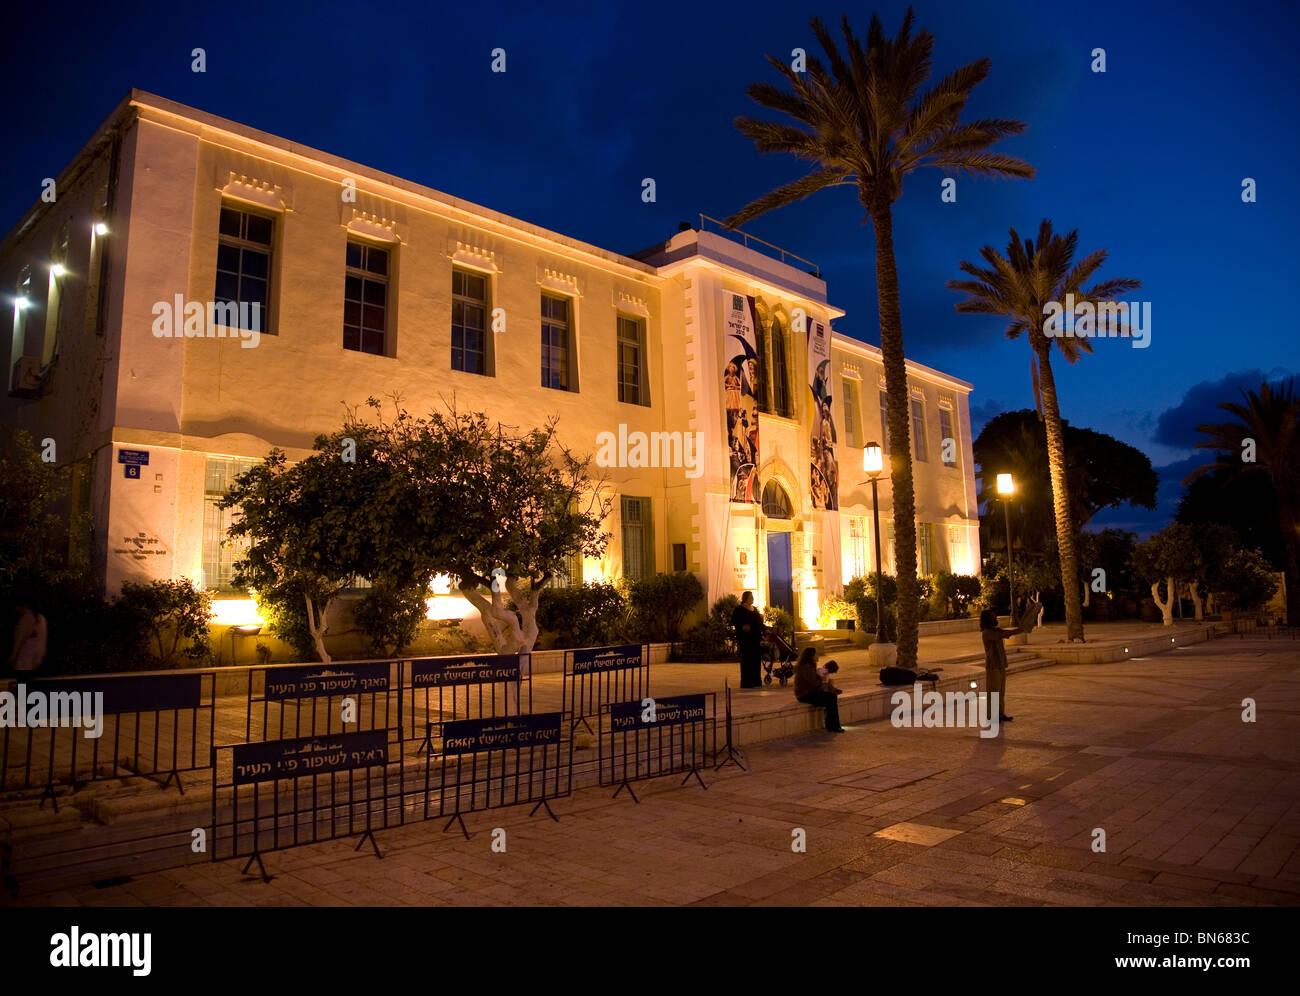 Yaron Yerushalmi  Hall - Susan Delal Cultural Centre in Neve Tzedek area, Tel Aviv Stock Photo